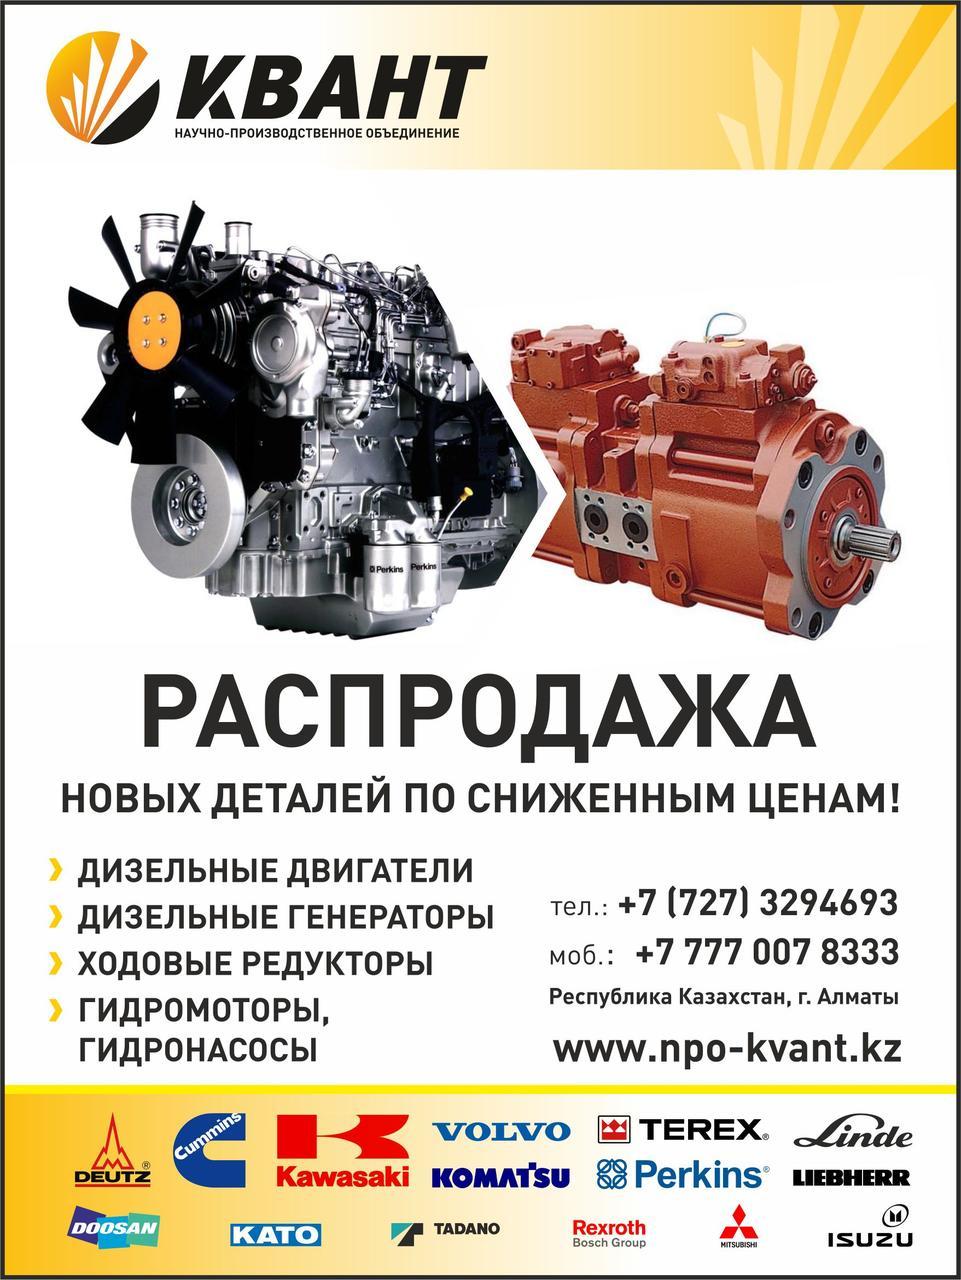 Двигатель Deutz F6L413FRW, Deutz F6L413V, Deutz F6L 912, Deutz F6L 913, Deutz F6L812, Deutz Deutz A8L714